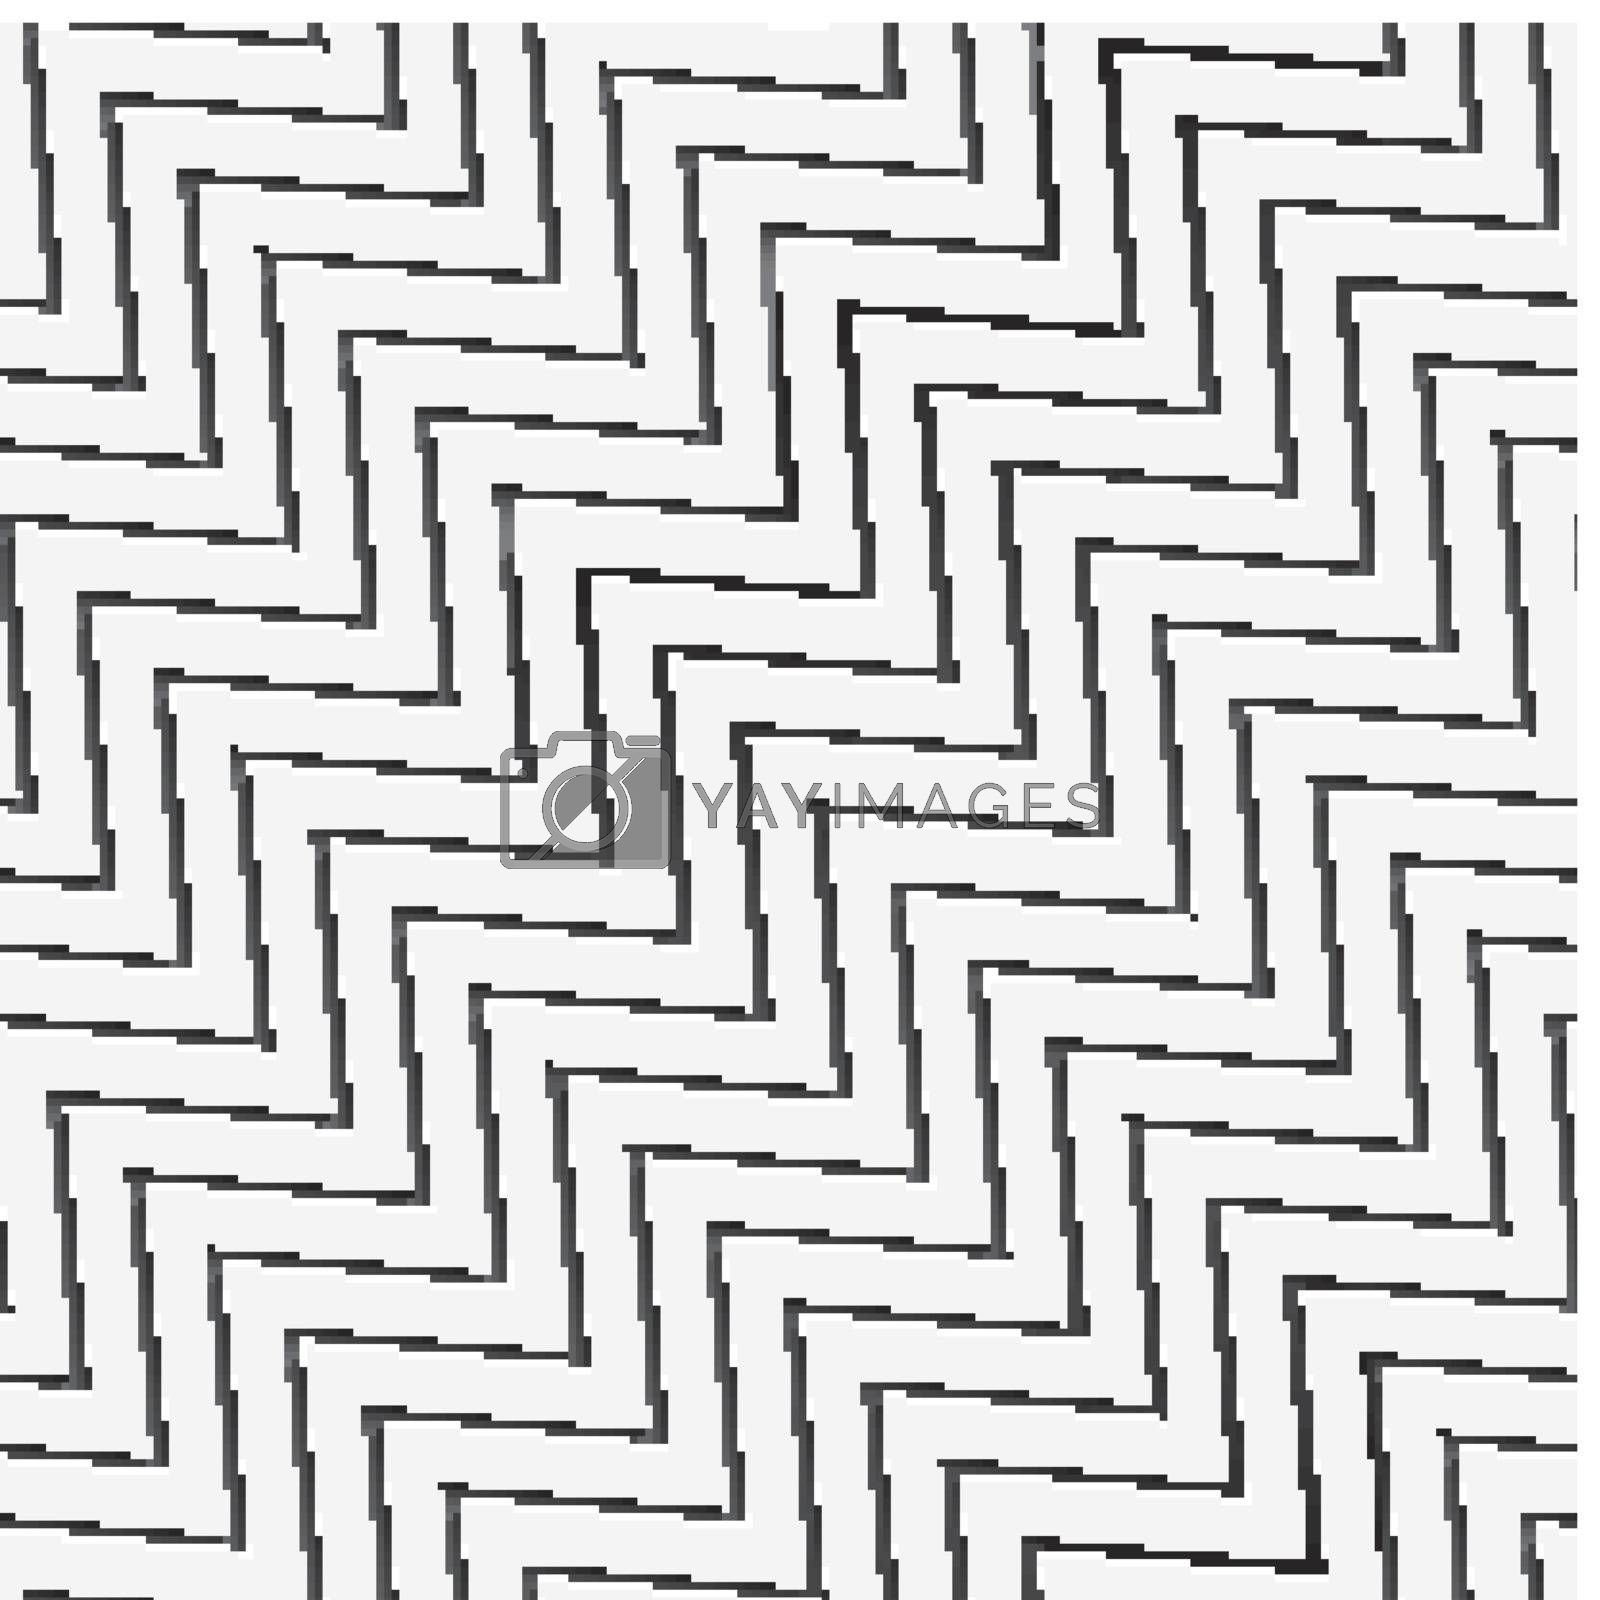 Seamless zigzag wide with long shadow by Zebra-Finch